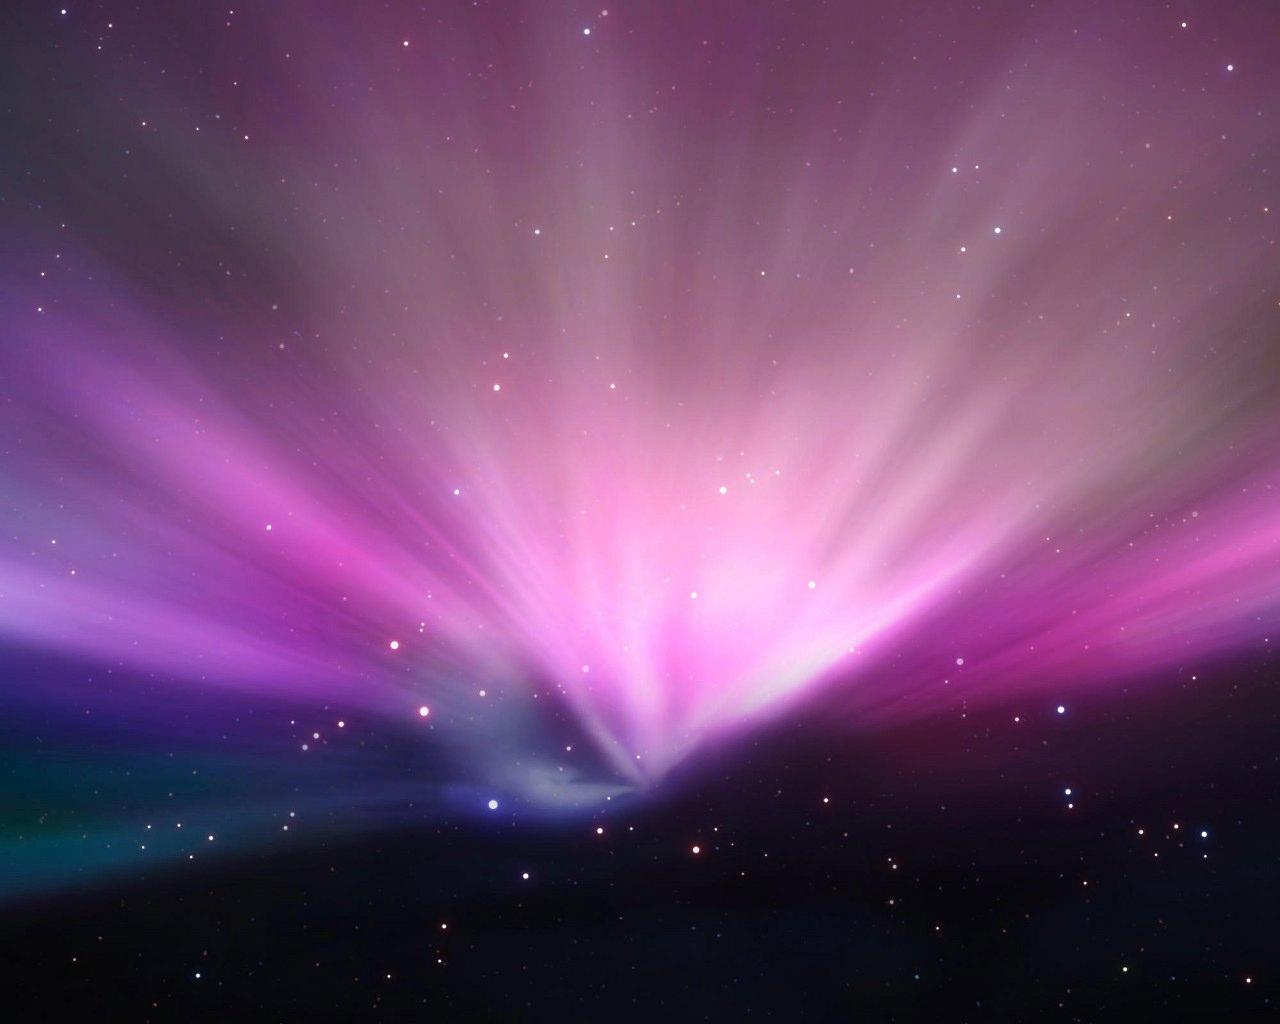 http://1.bp.blogspot.com/_2UbsSBz9ckE/TEHsoH9DM5I/AAAAAAAABR8/auscNgIsPRw/s1600/aurora+mac14_1280x1024.jpg